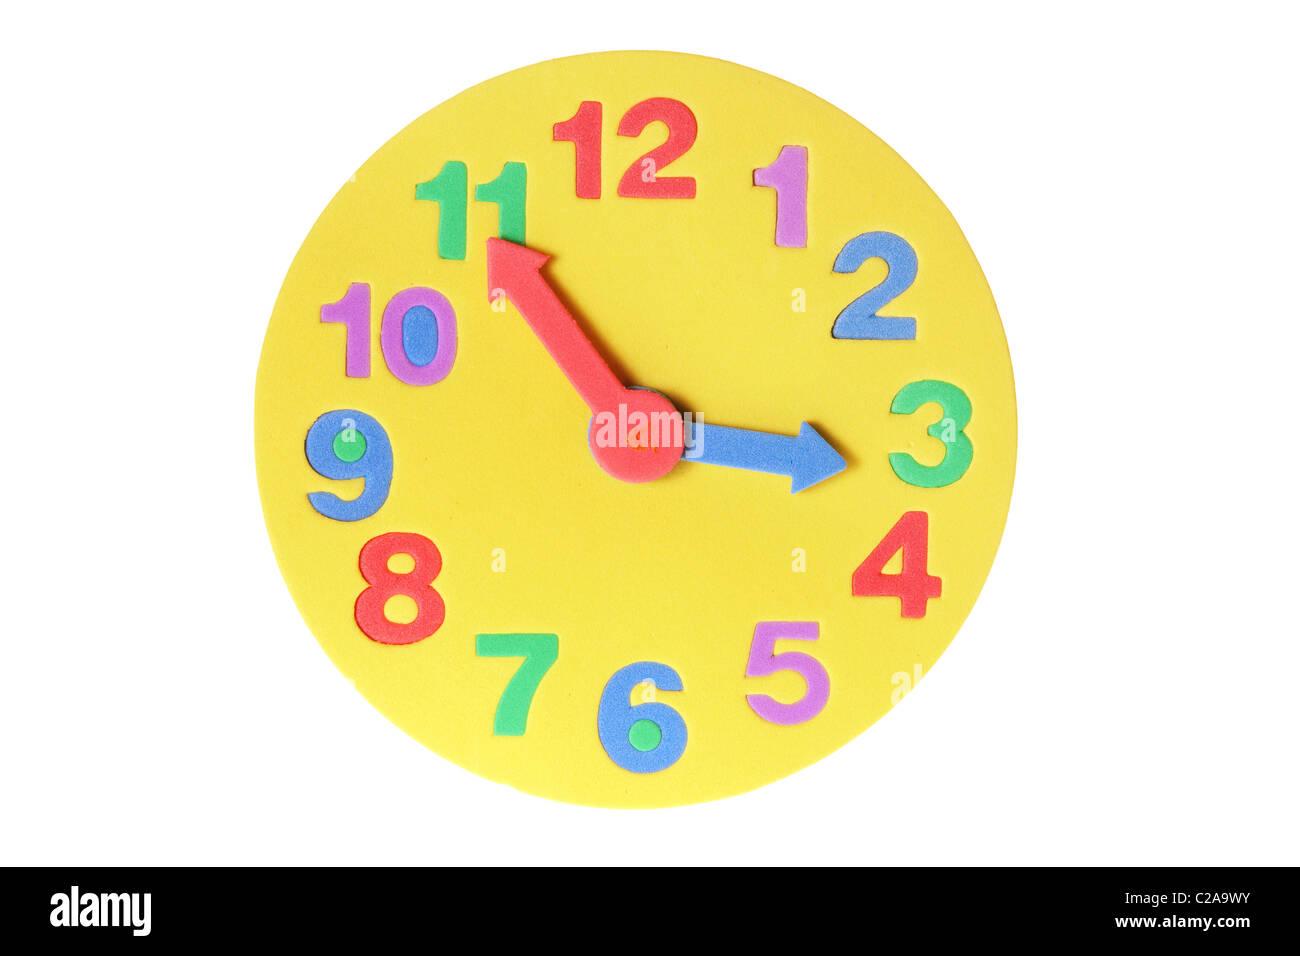 Reloj de juguete Imagen De Stock